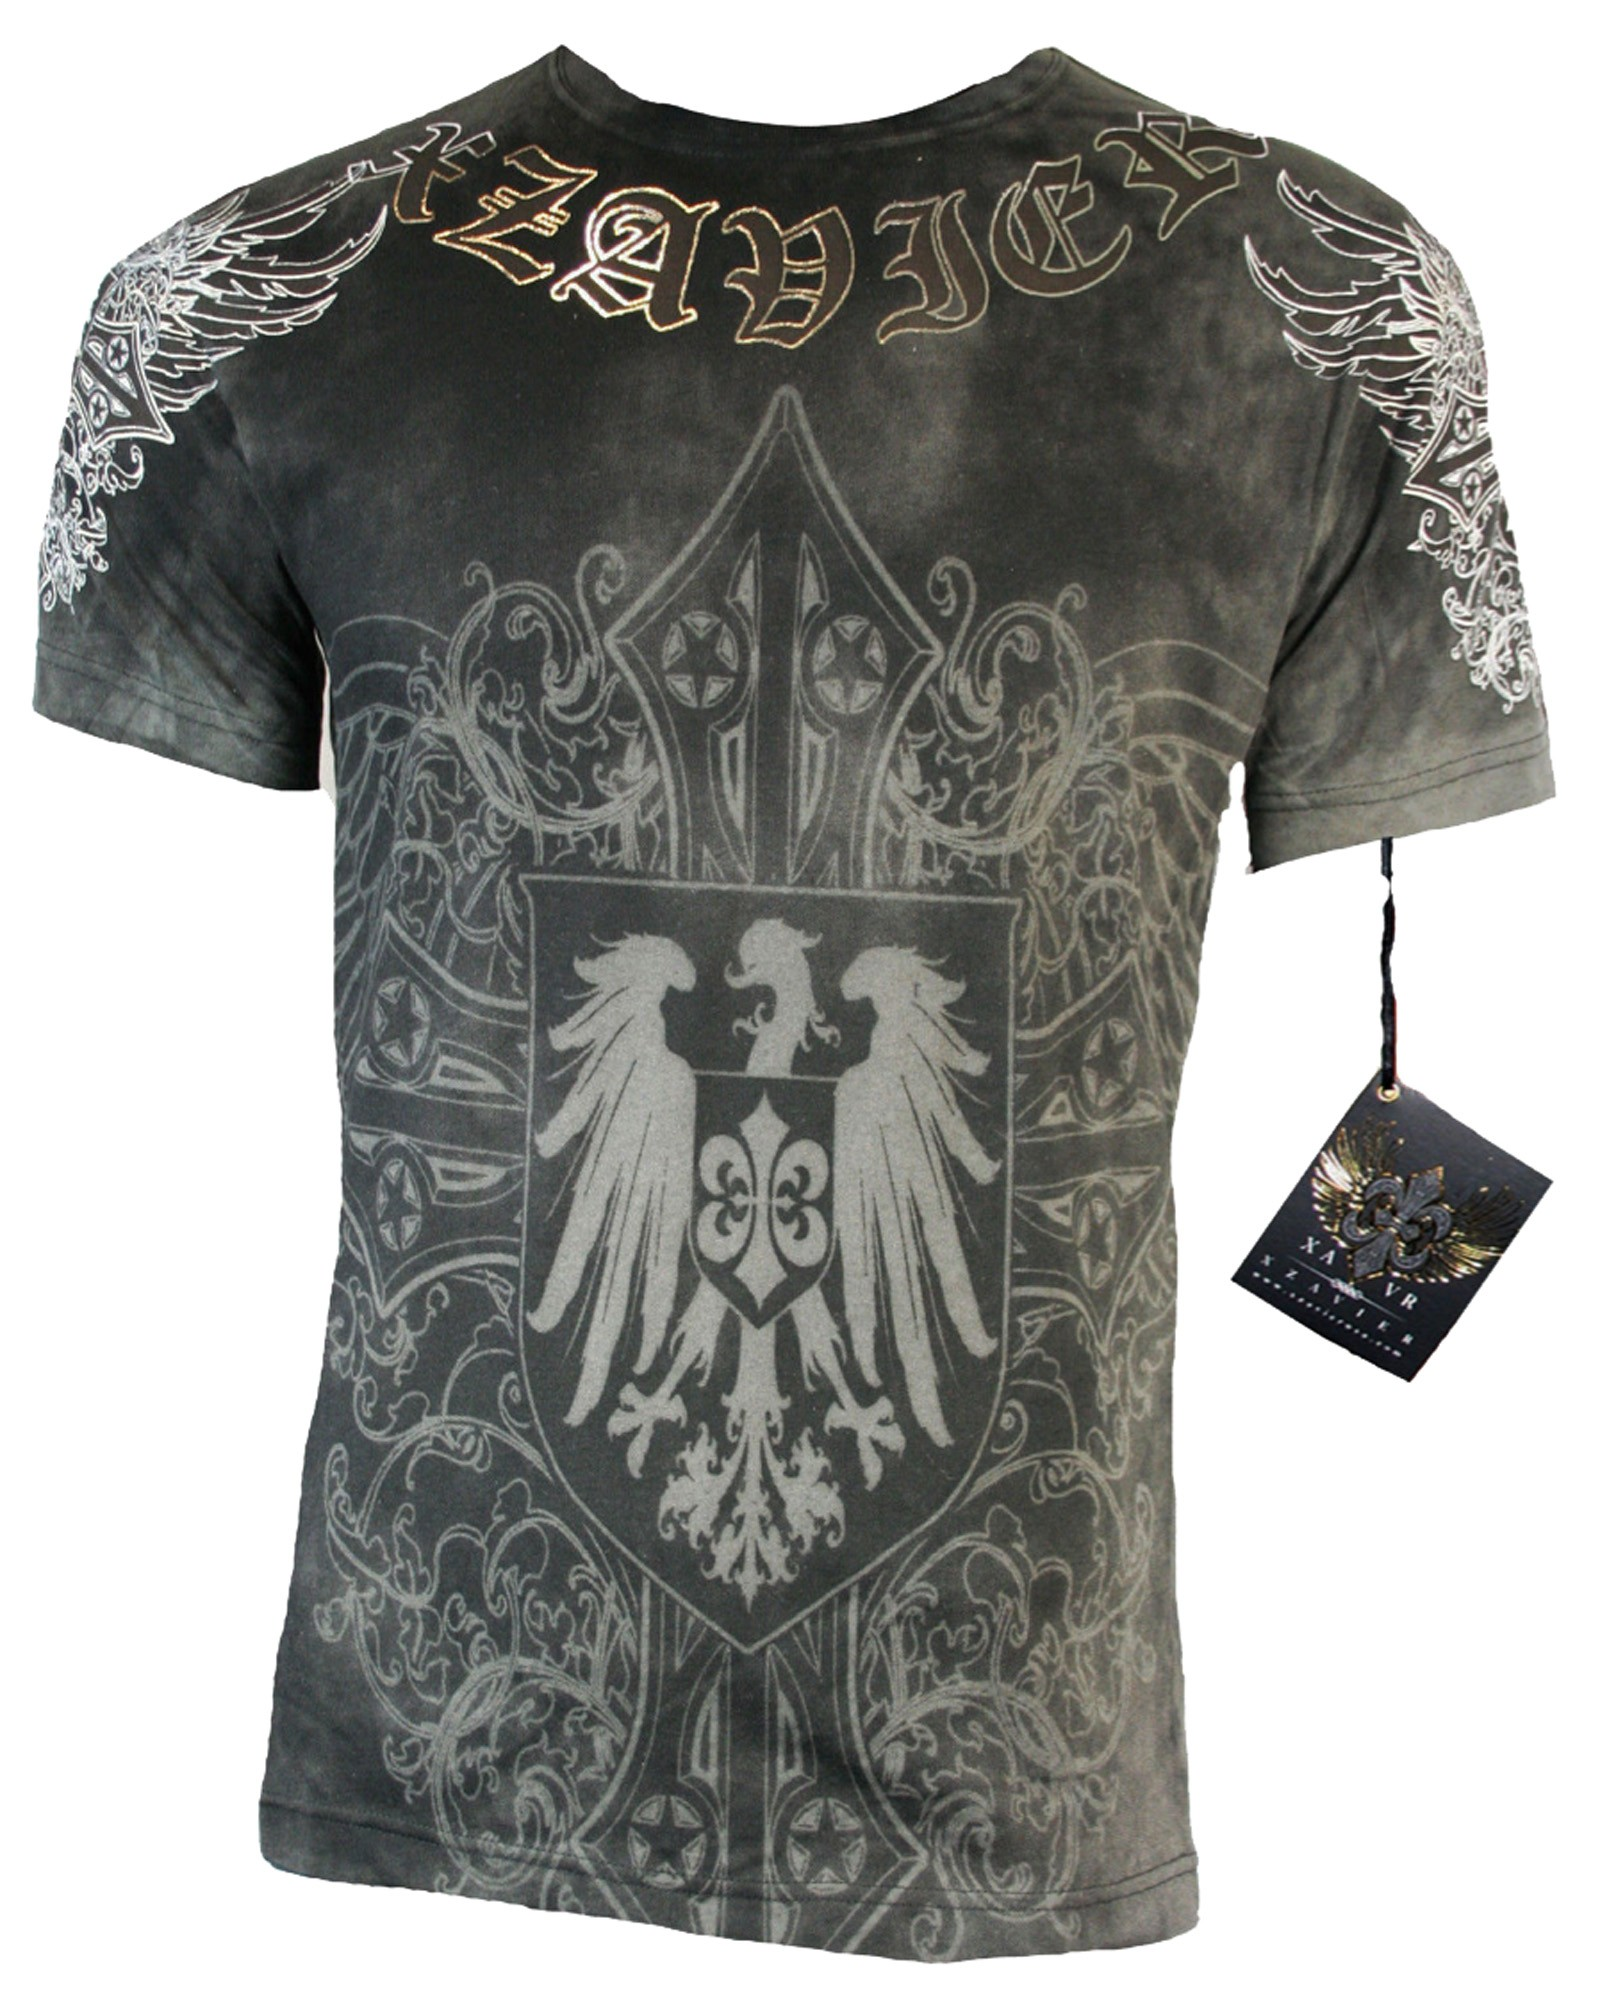 Xzavier - Delusion T-Shirt Front